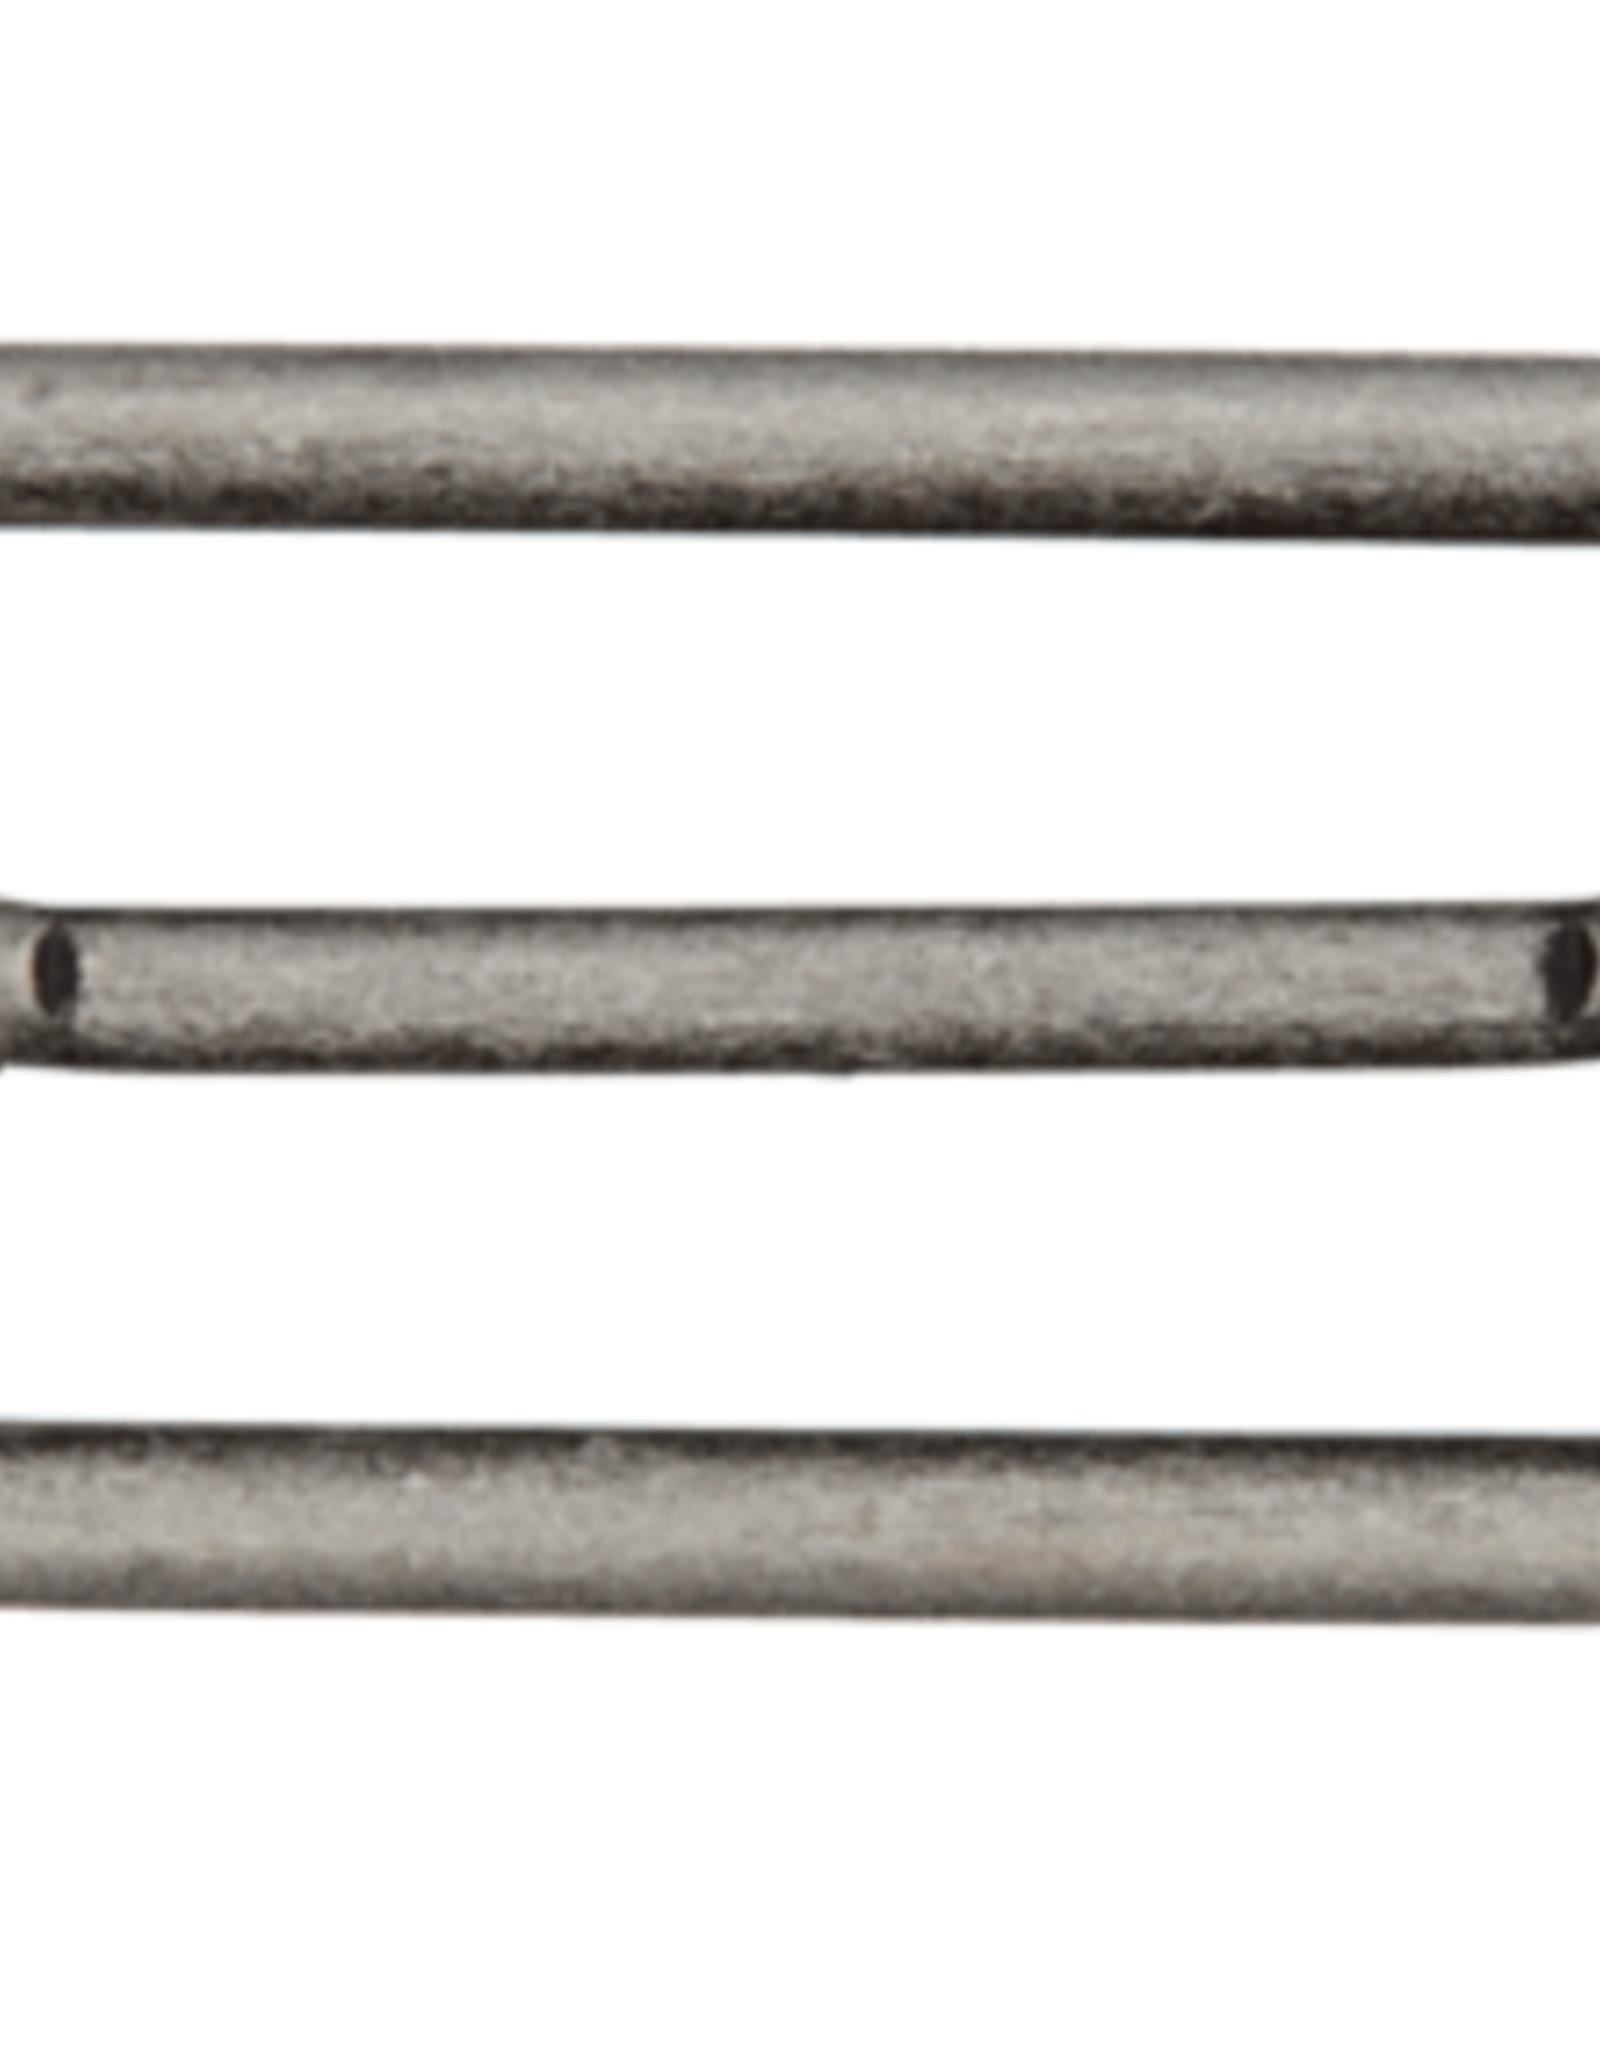 Schuifgesp 40mm - Grijs